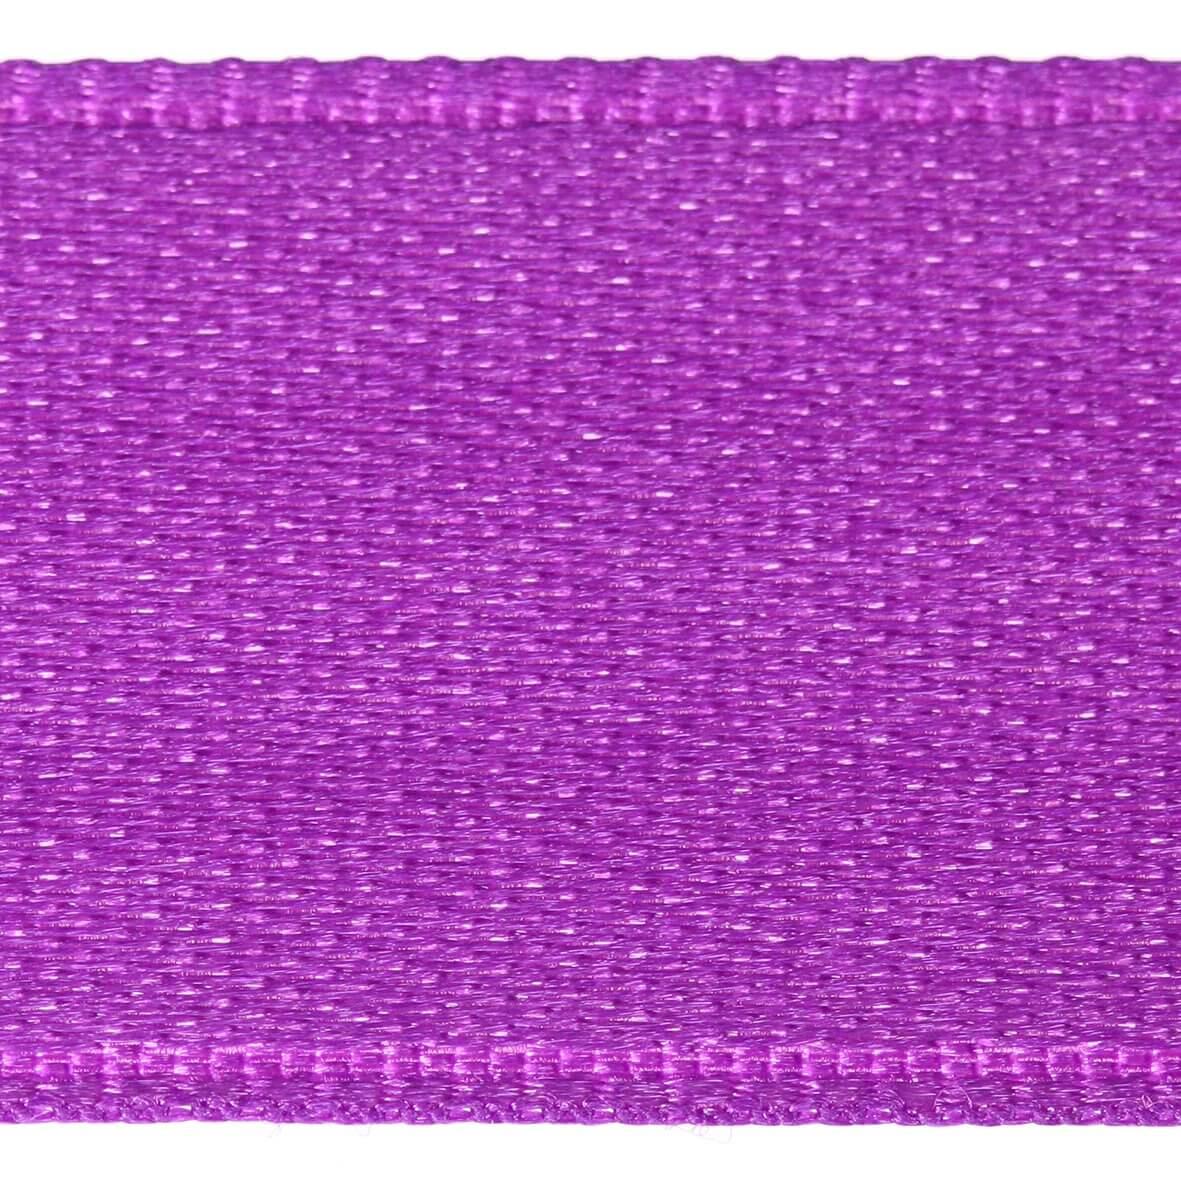 Violet Col. 232 - 6mm Satab Satin Ribbon